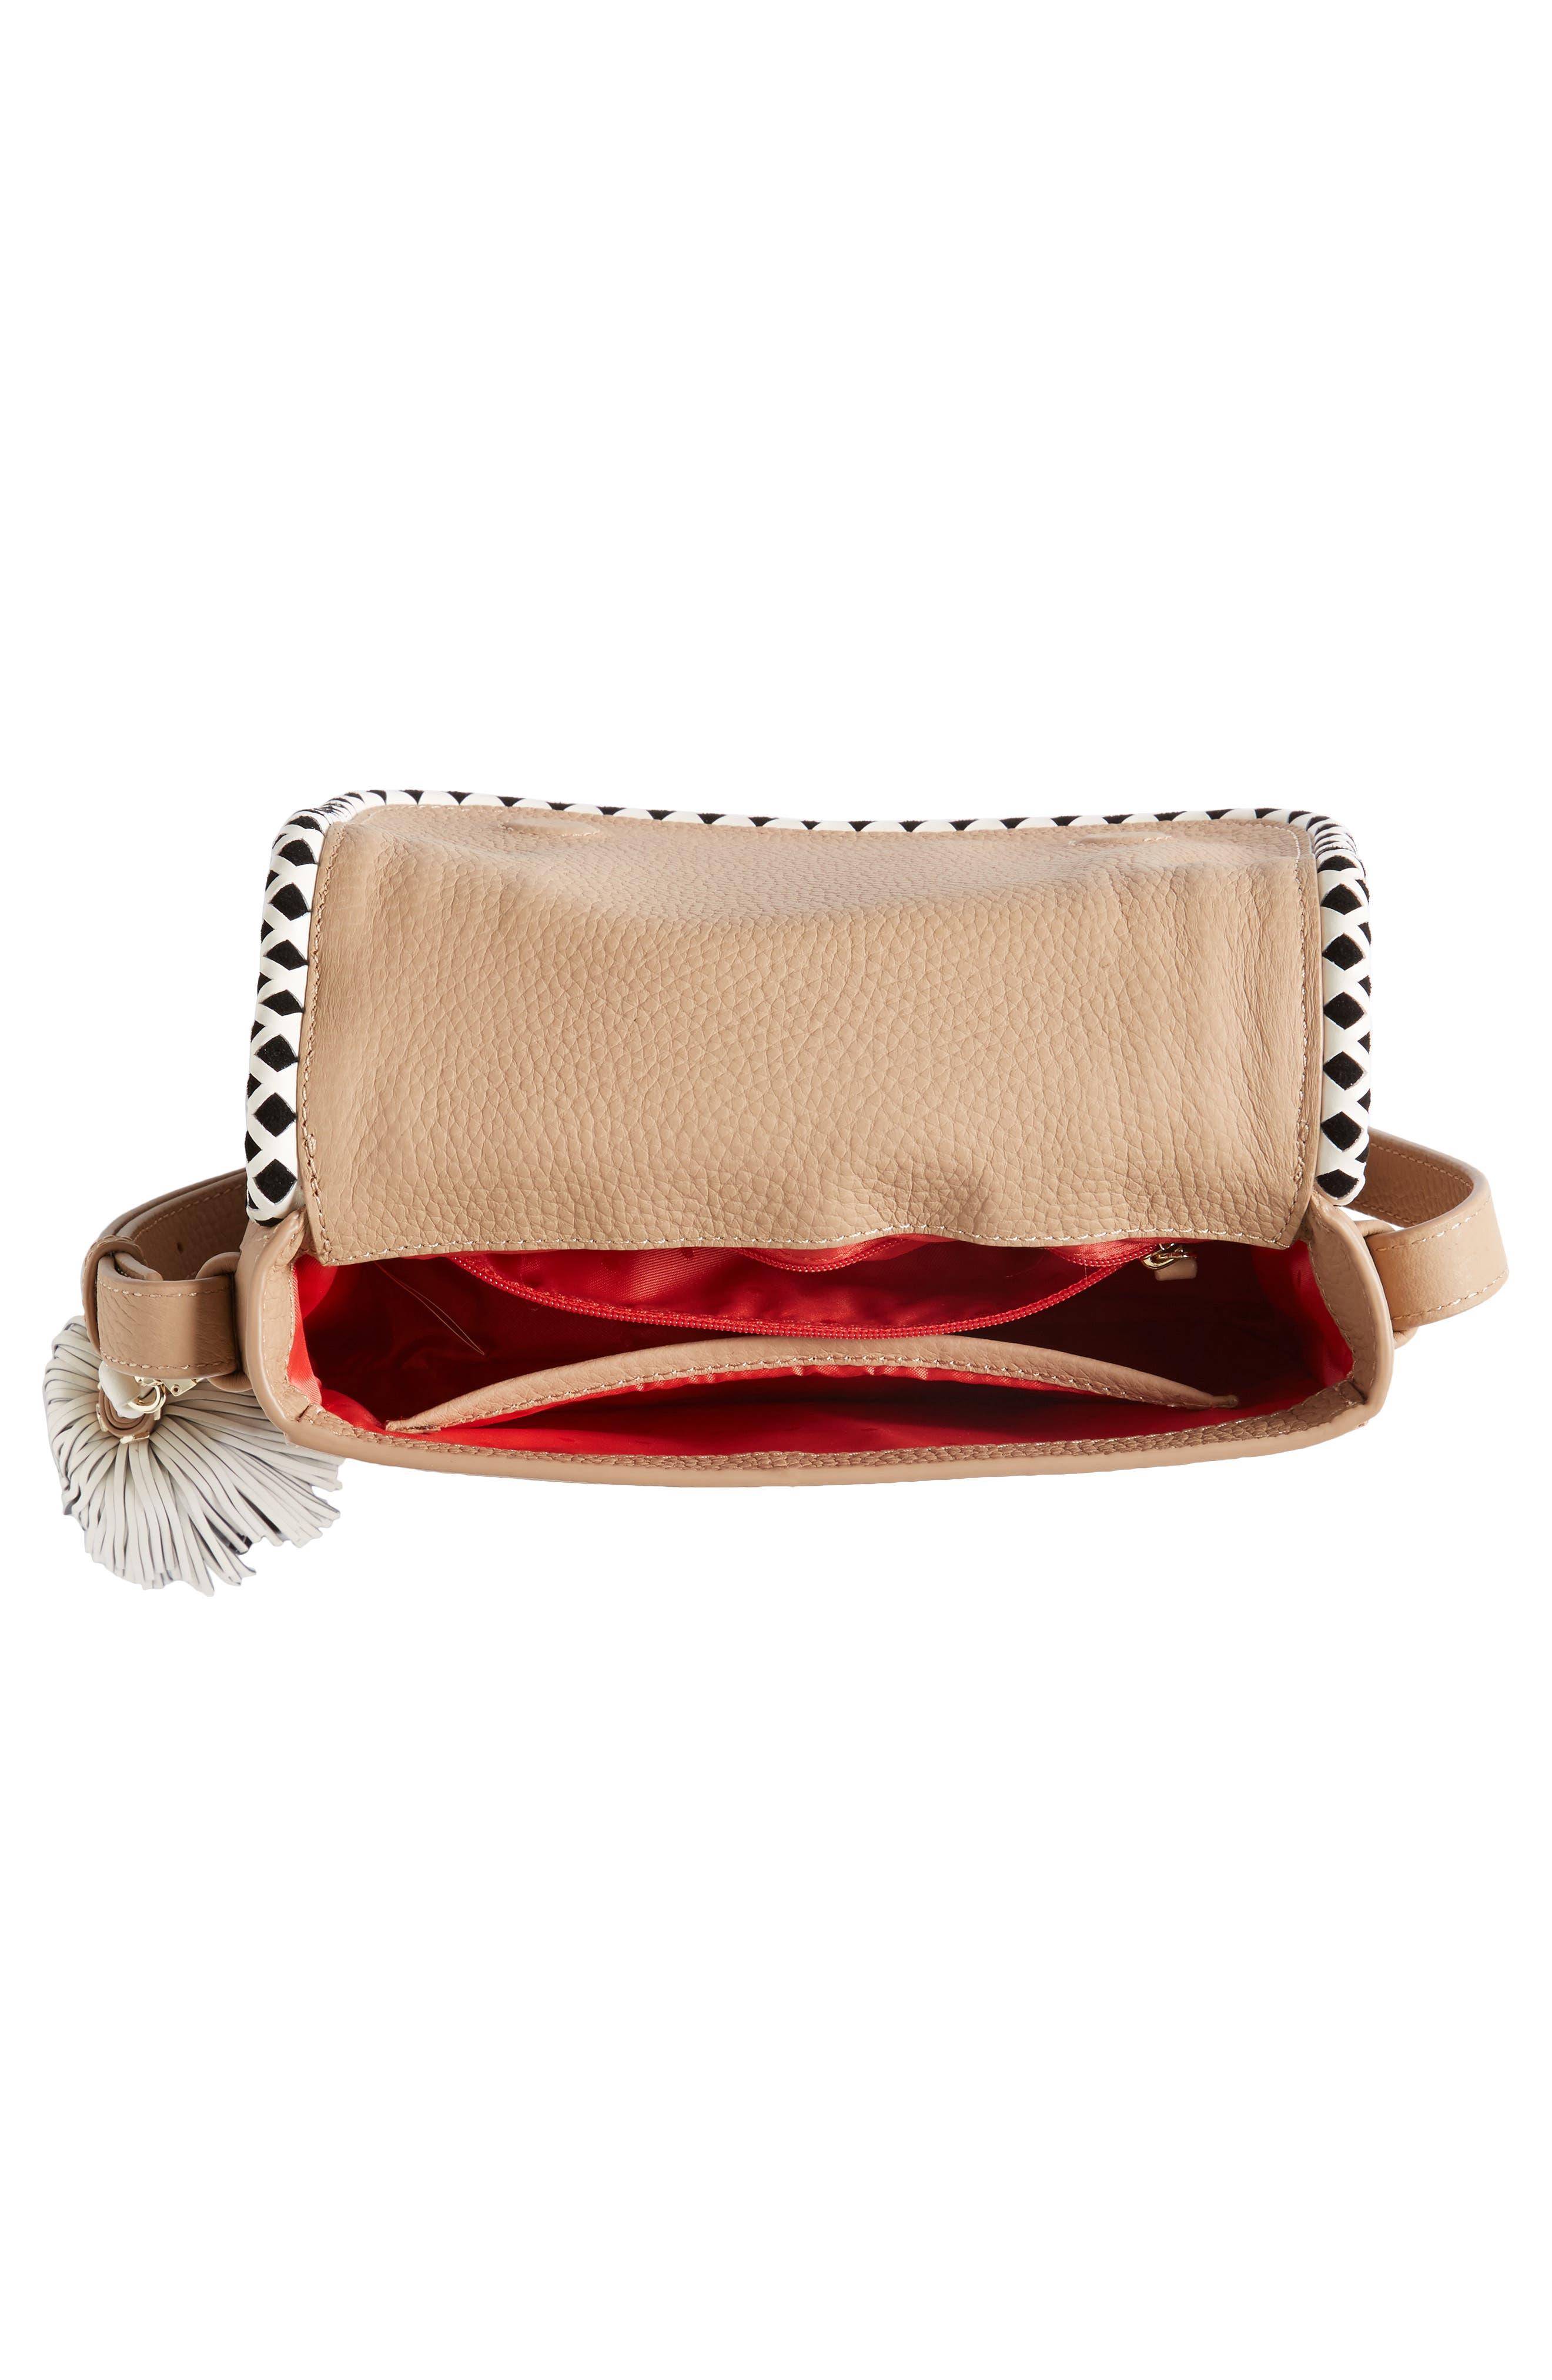 crown street - jasper leather saddle bag,                             Alternate thumbnail 4, color,                             248